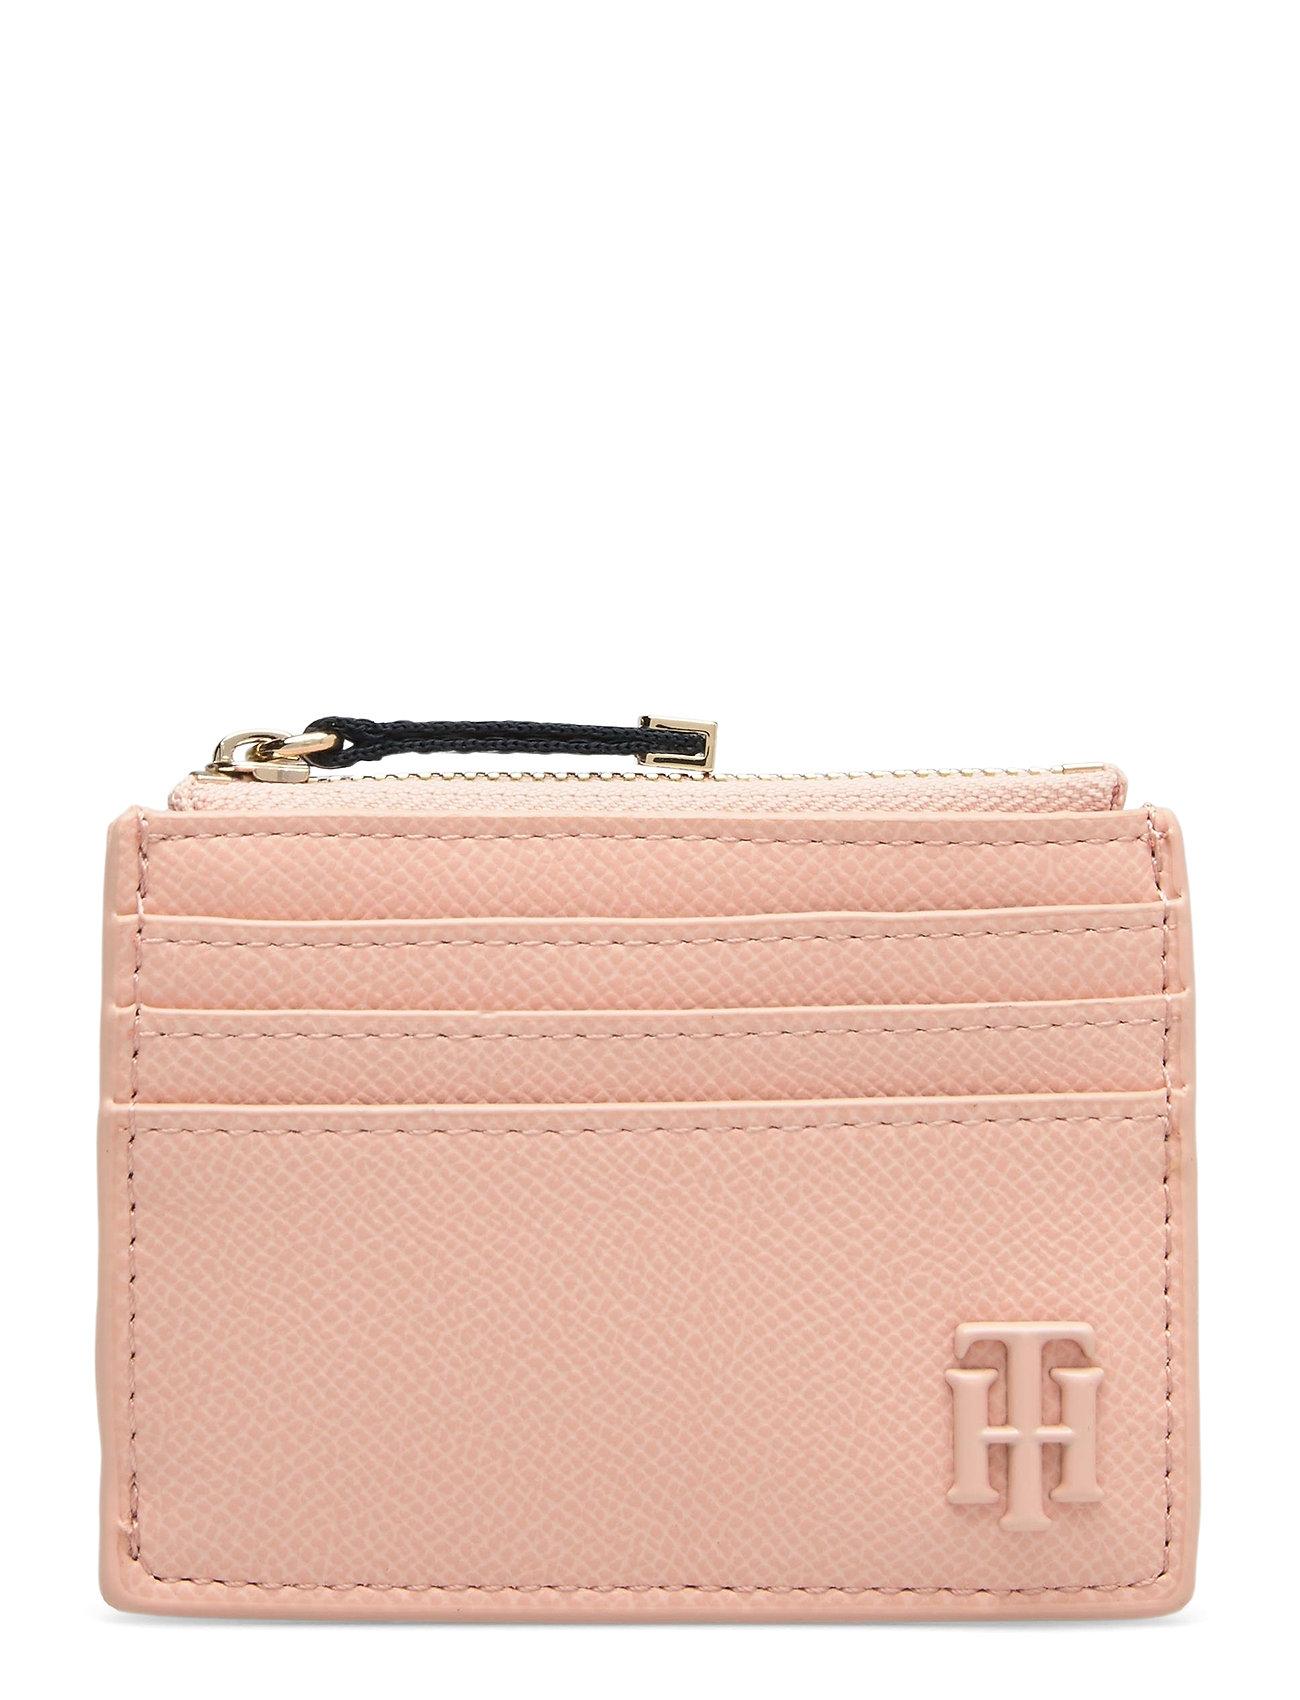 Image of Saffiano Cc Holder Bags Card Holders & Wallets Card Holder Tommy Hilfiger (3419555109)